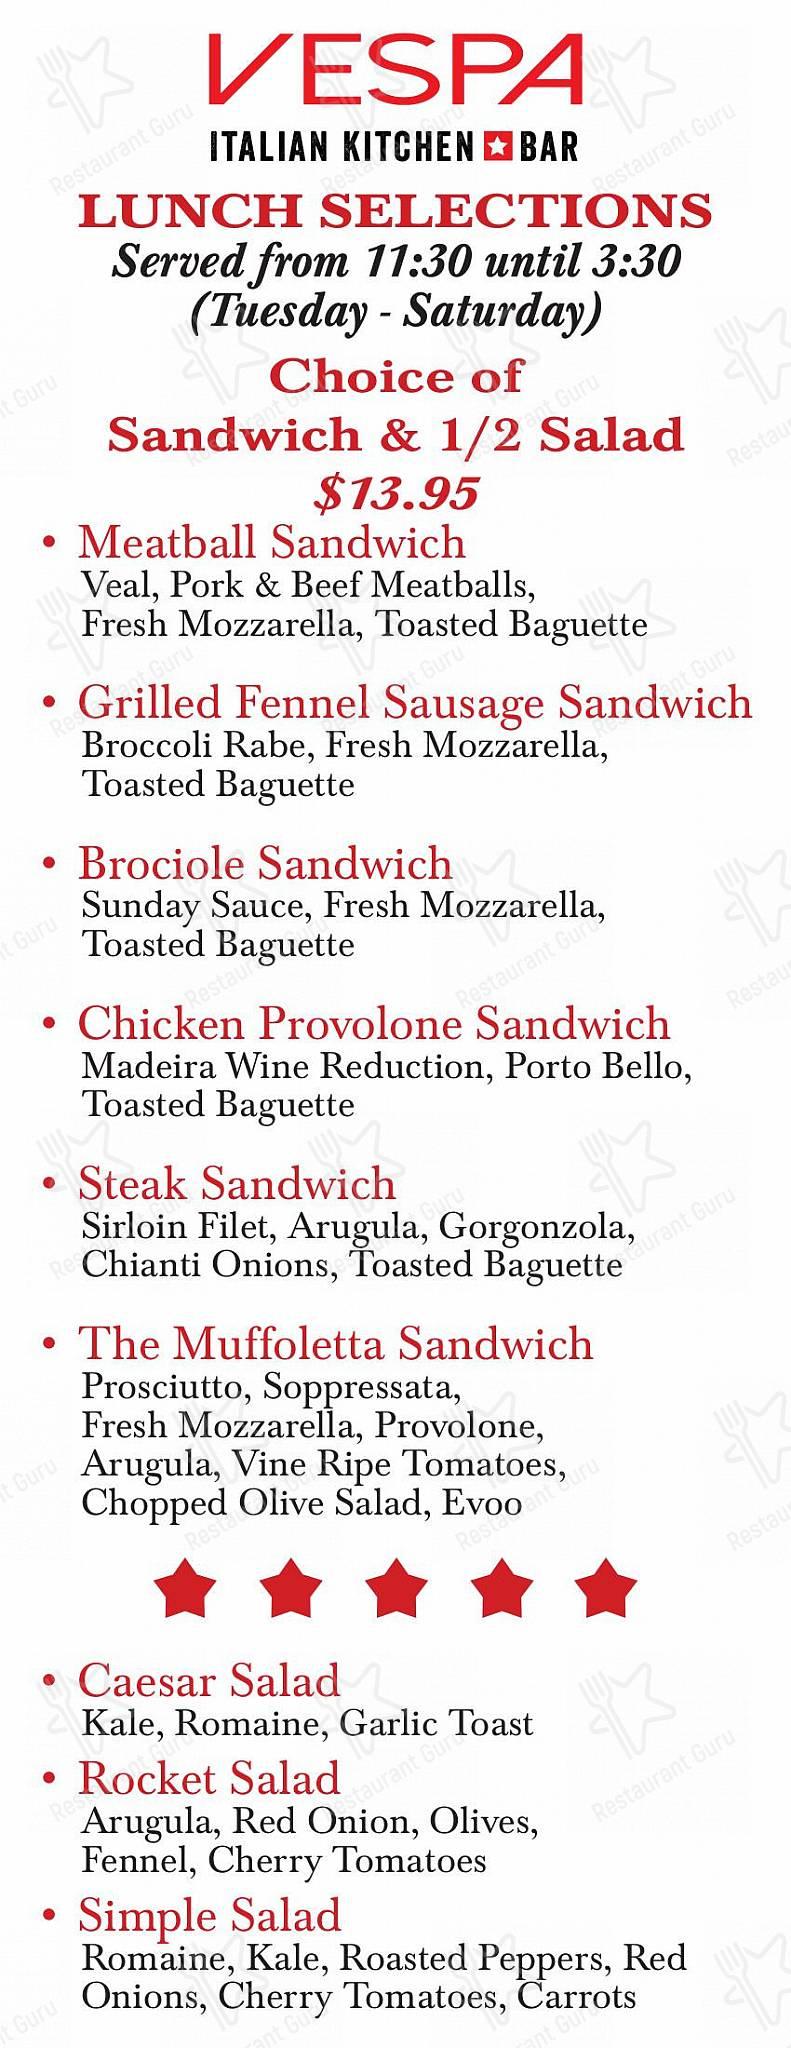 Vespa Italian Kitchen Bar In Farmingdale Restaurant Reviews